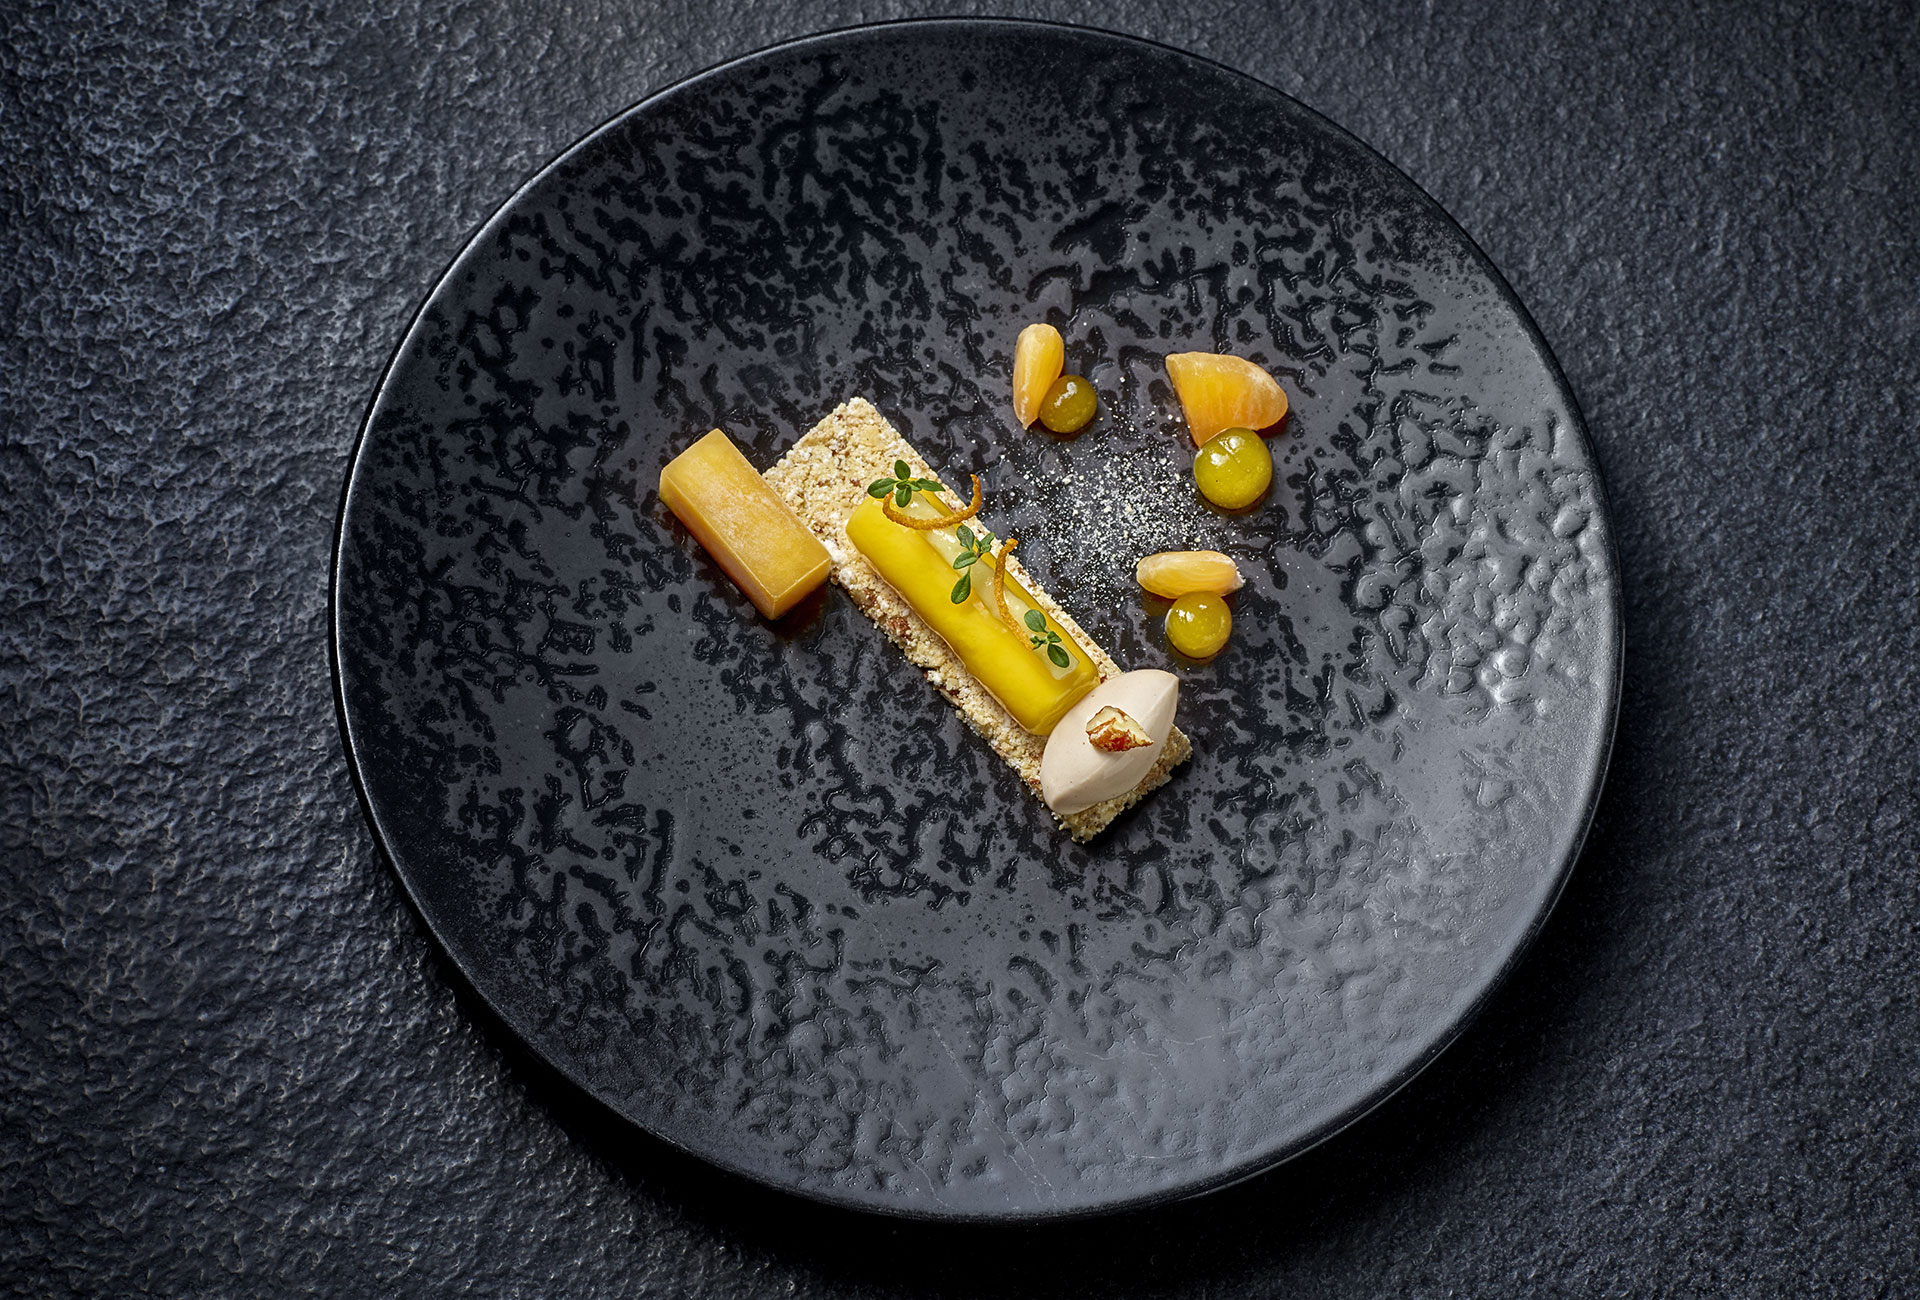 Fotoproduktion Werneckhof Foodstills Bild 21